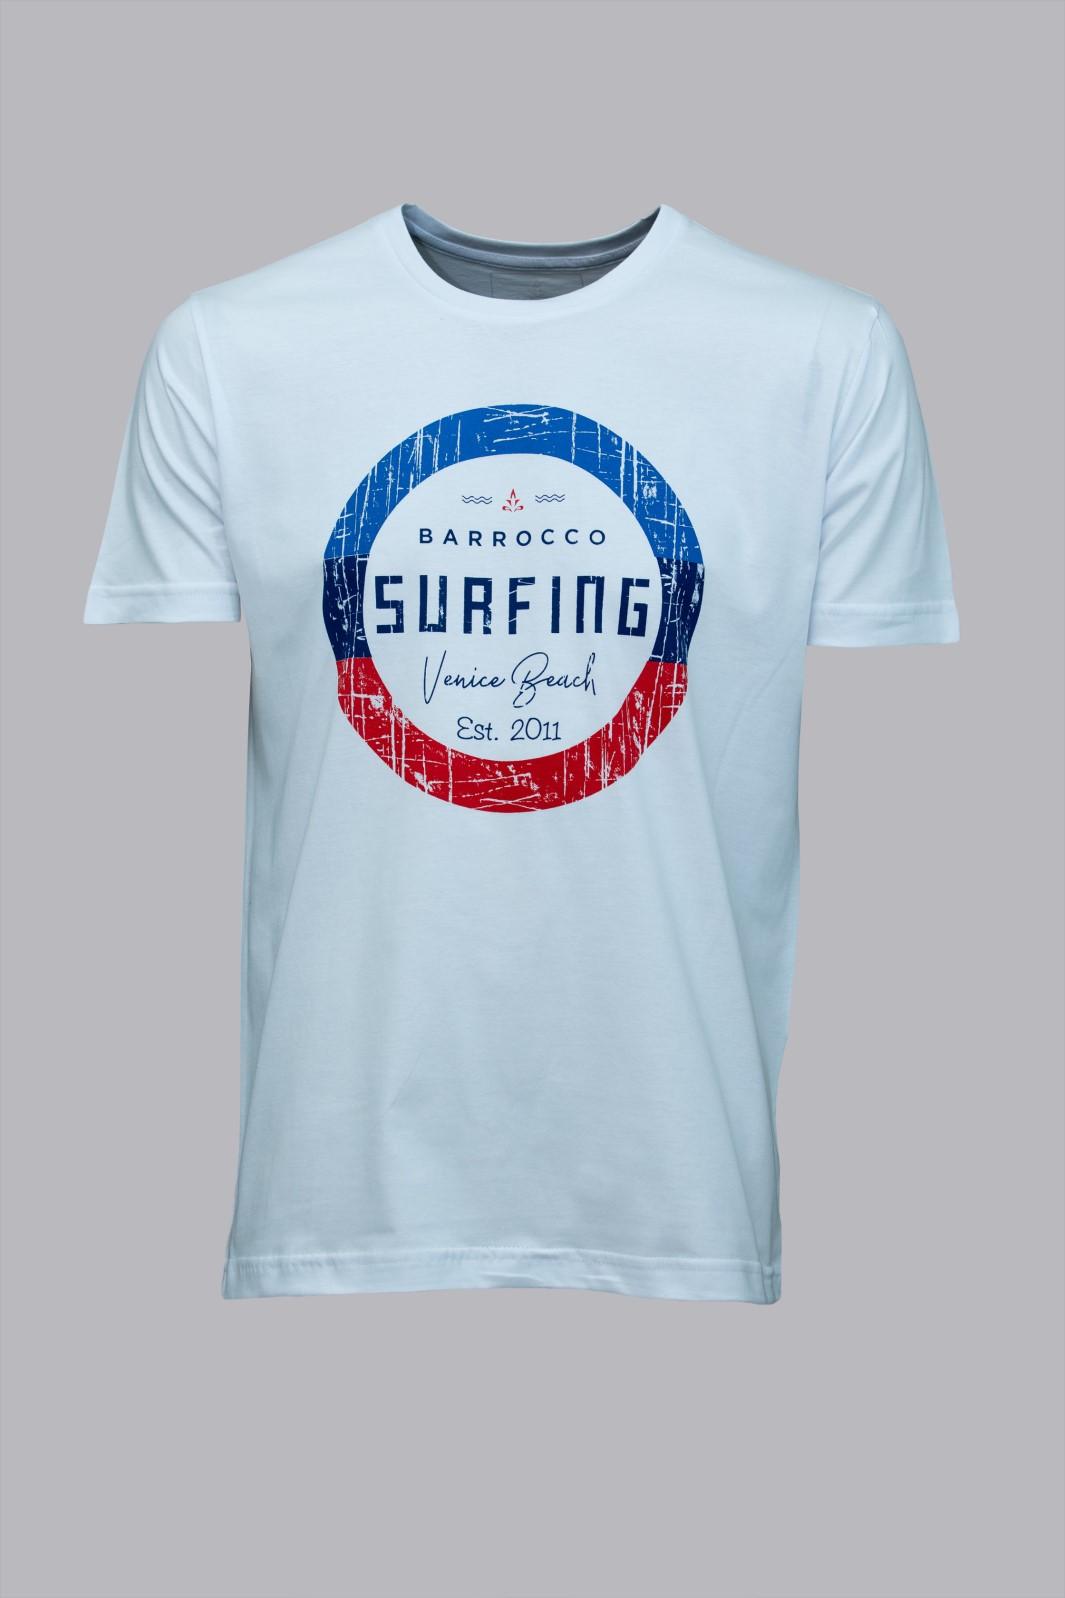 Camiseta Barrocco Surfing